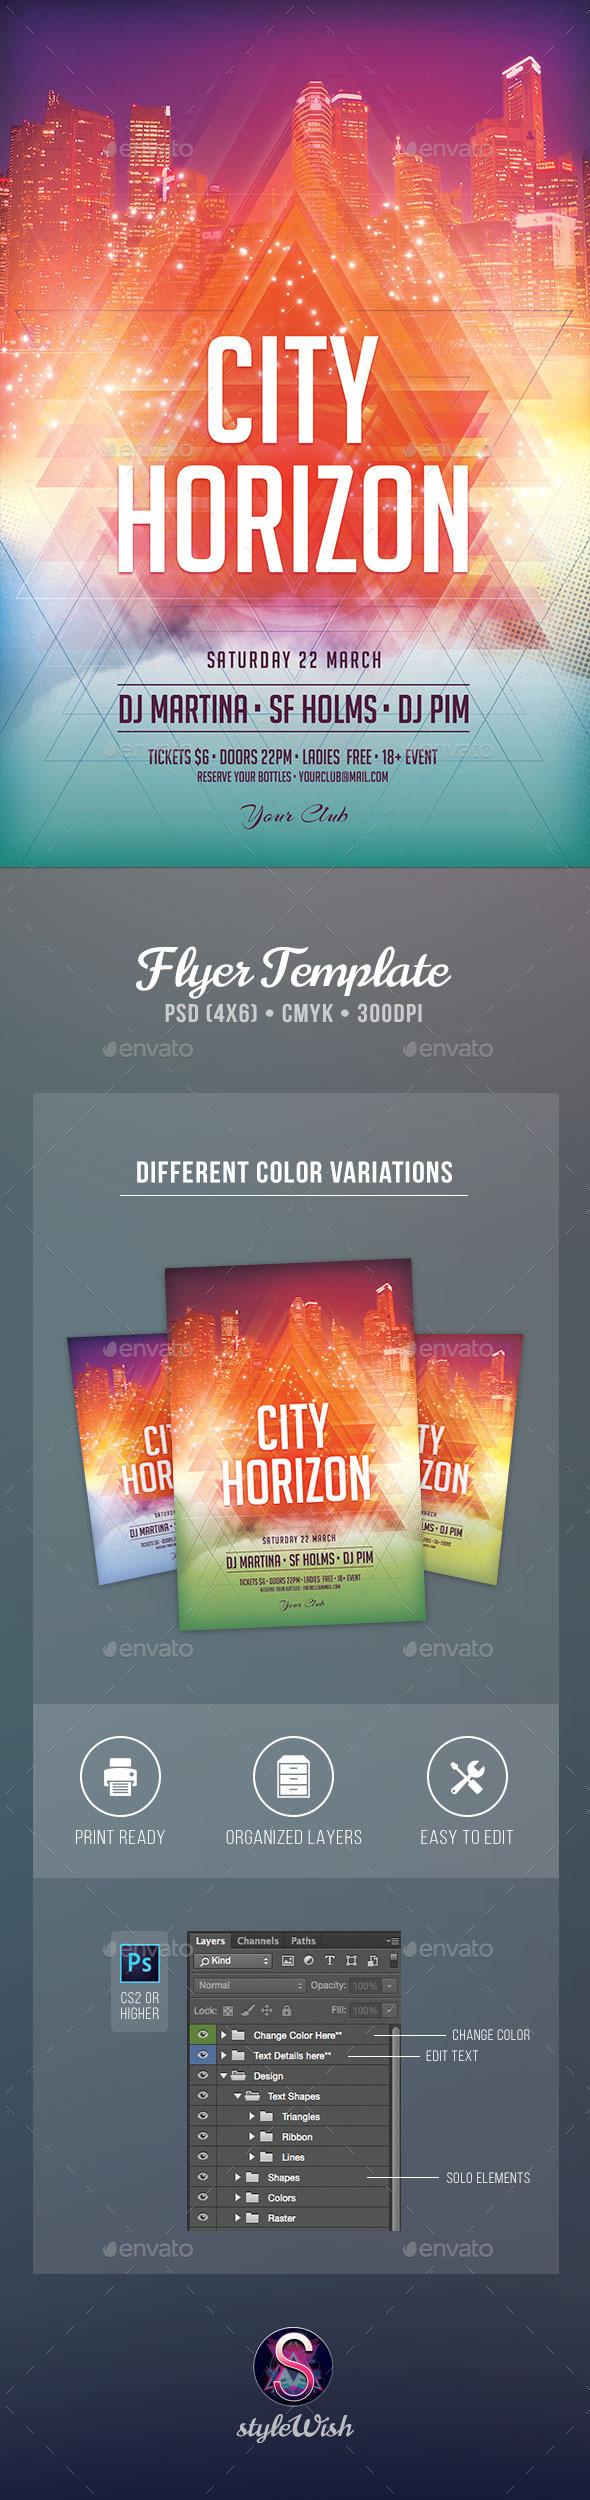 City Horizon Flyer - Clubs & Parties Events